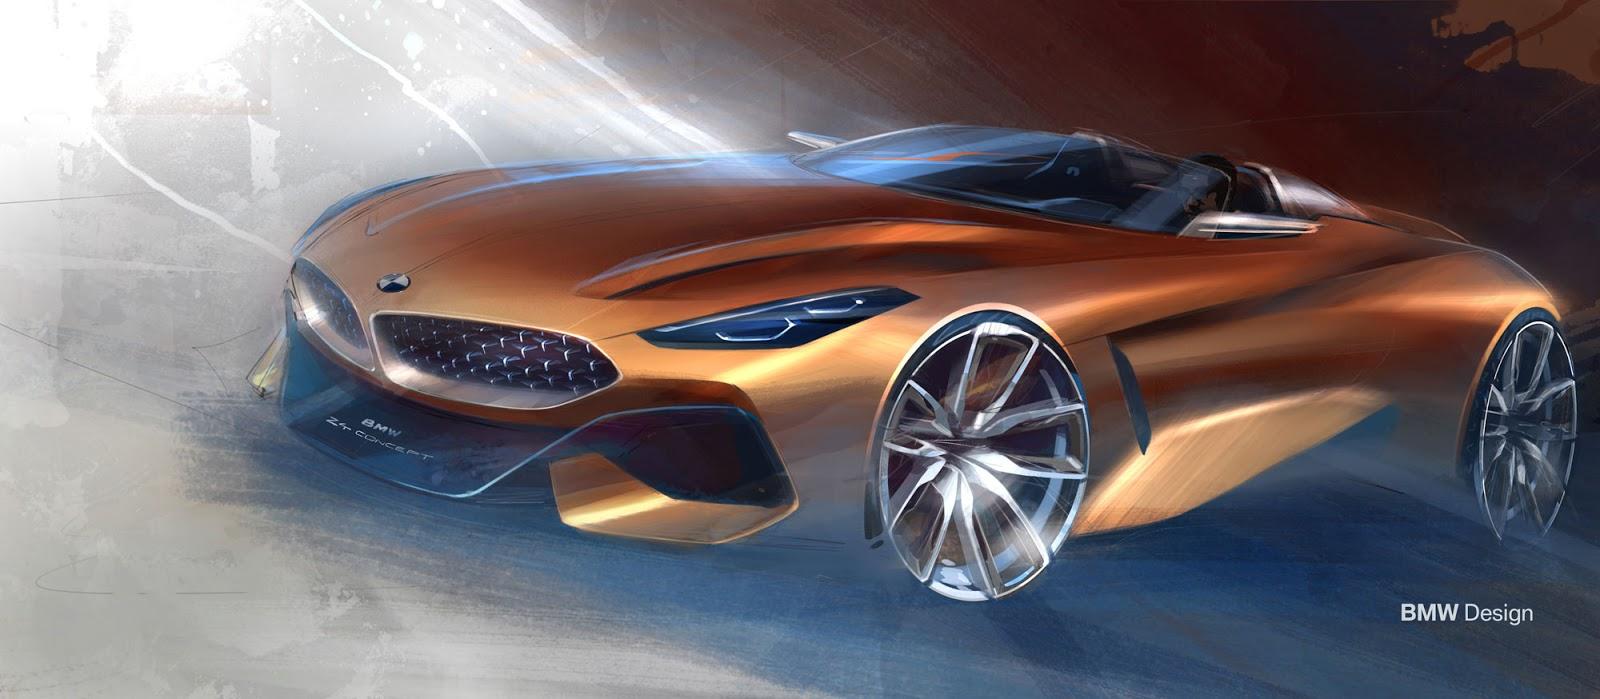 BMW Z4 sketch by Calvin Luk front quarter view